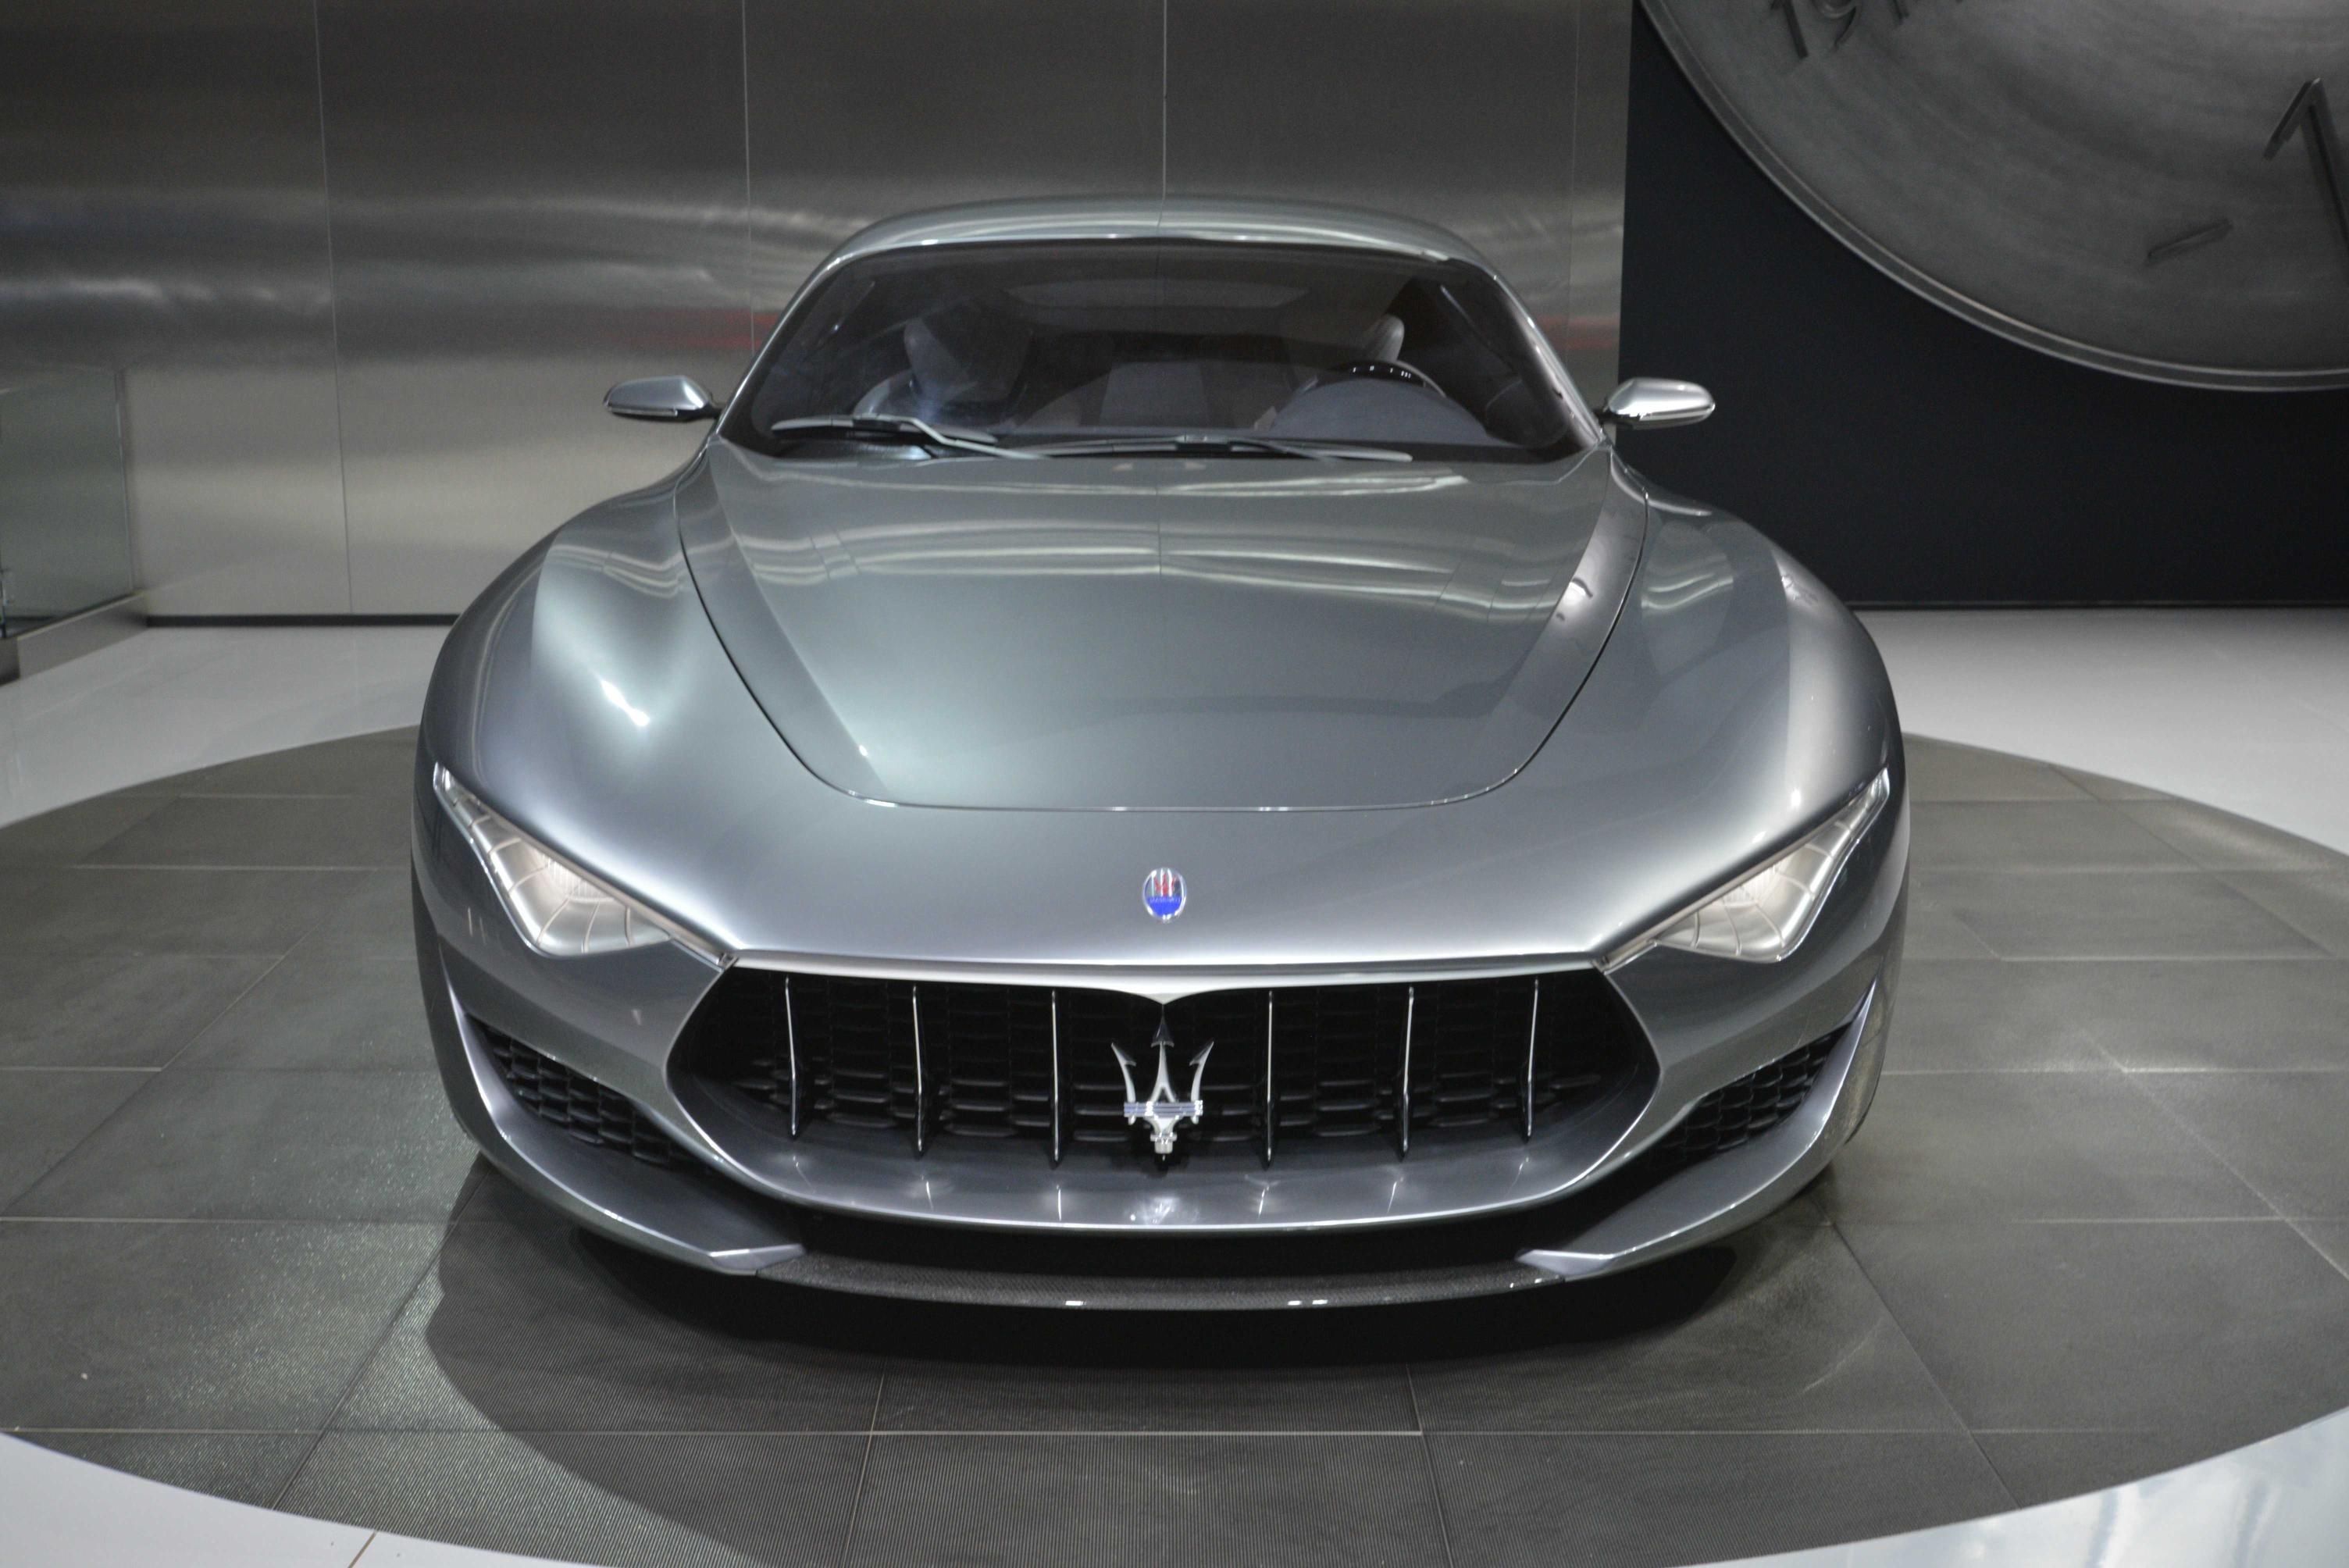 2017 Maserati Alfieri Rumors and Release Date